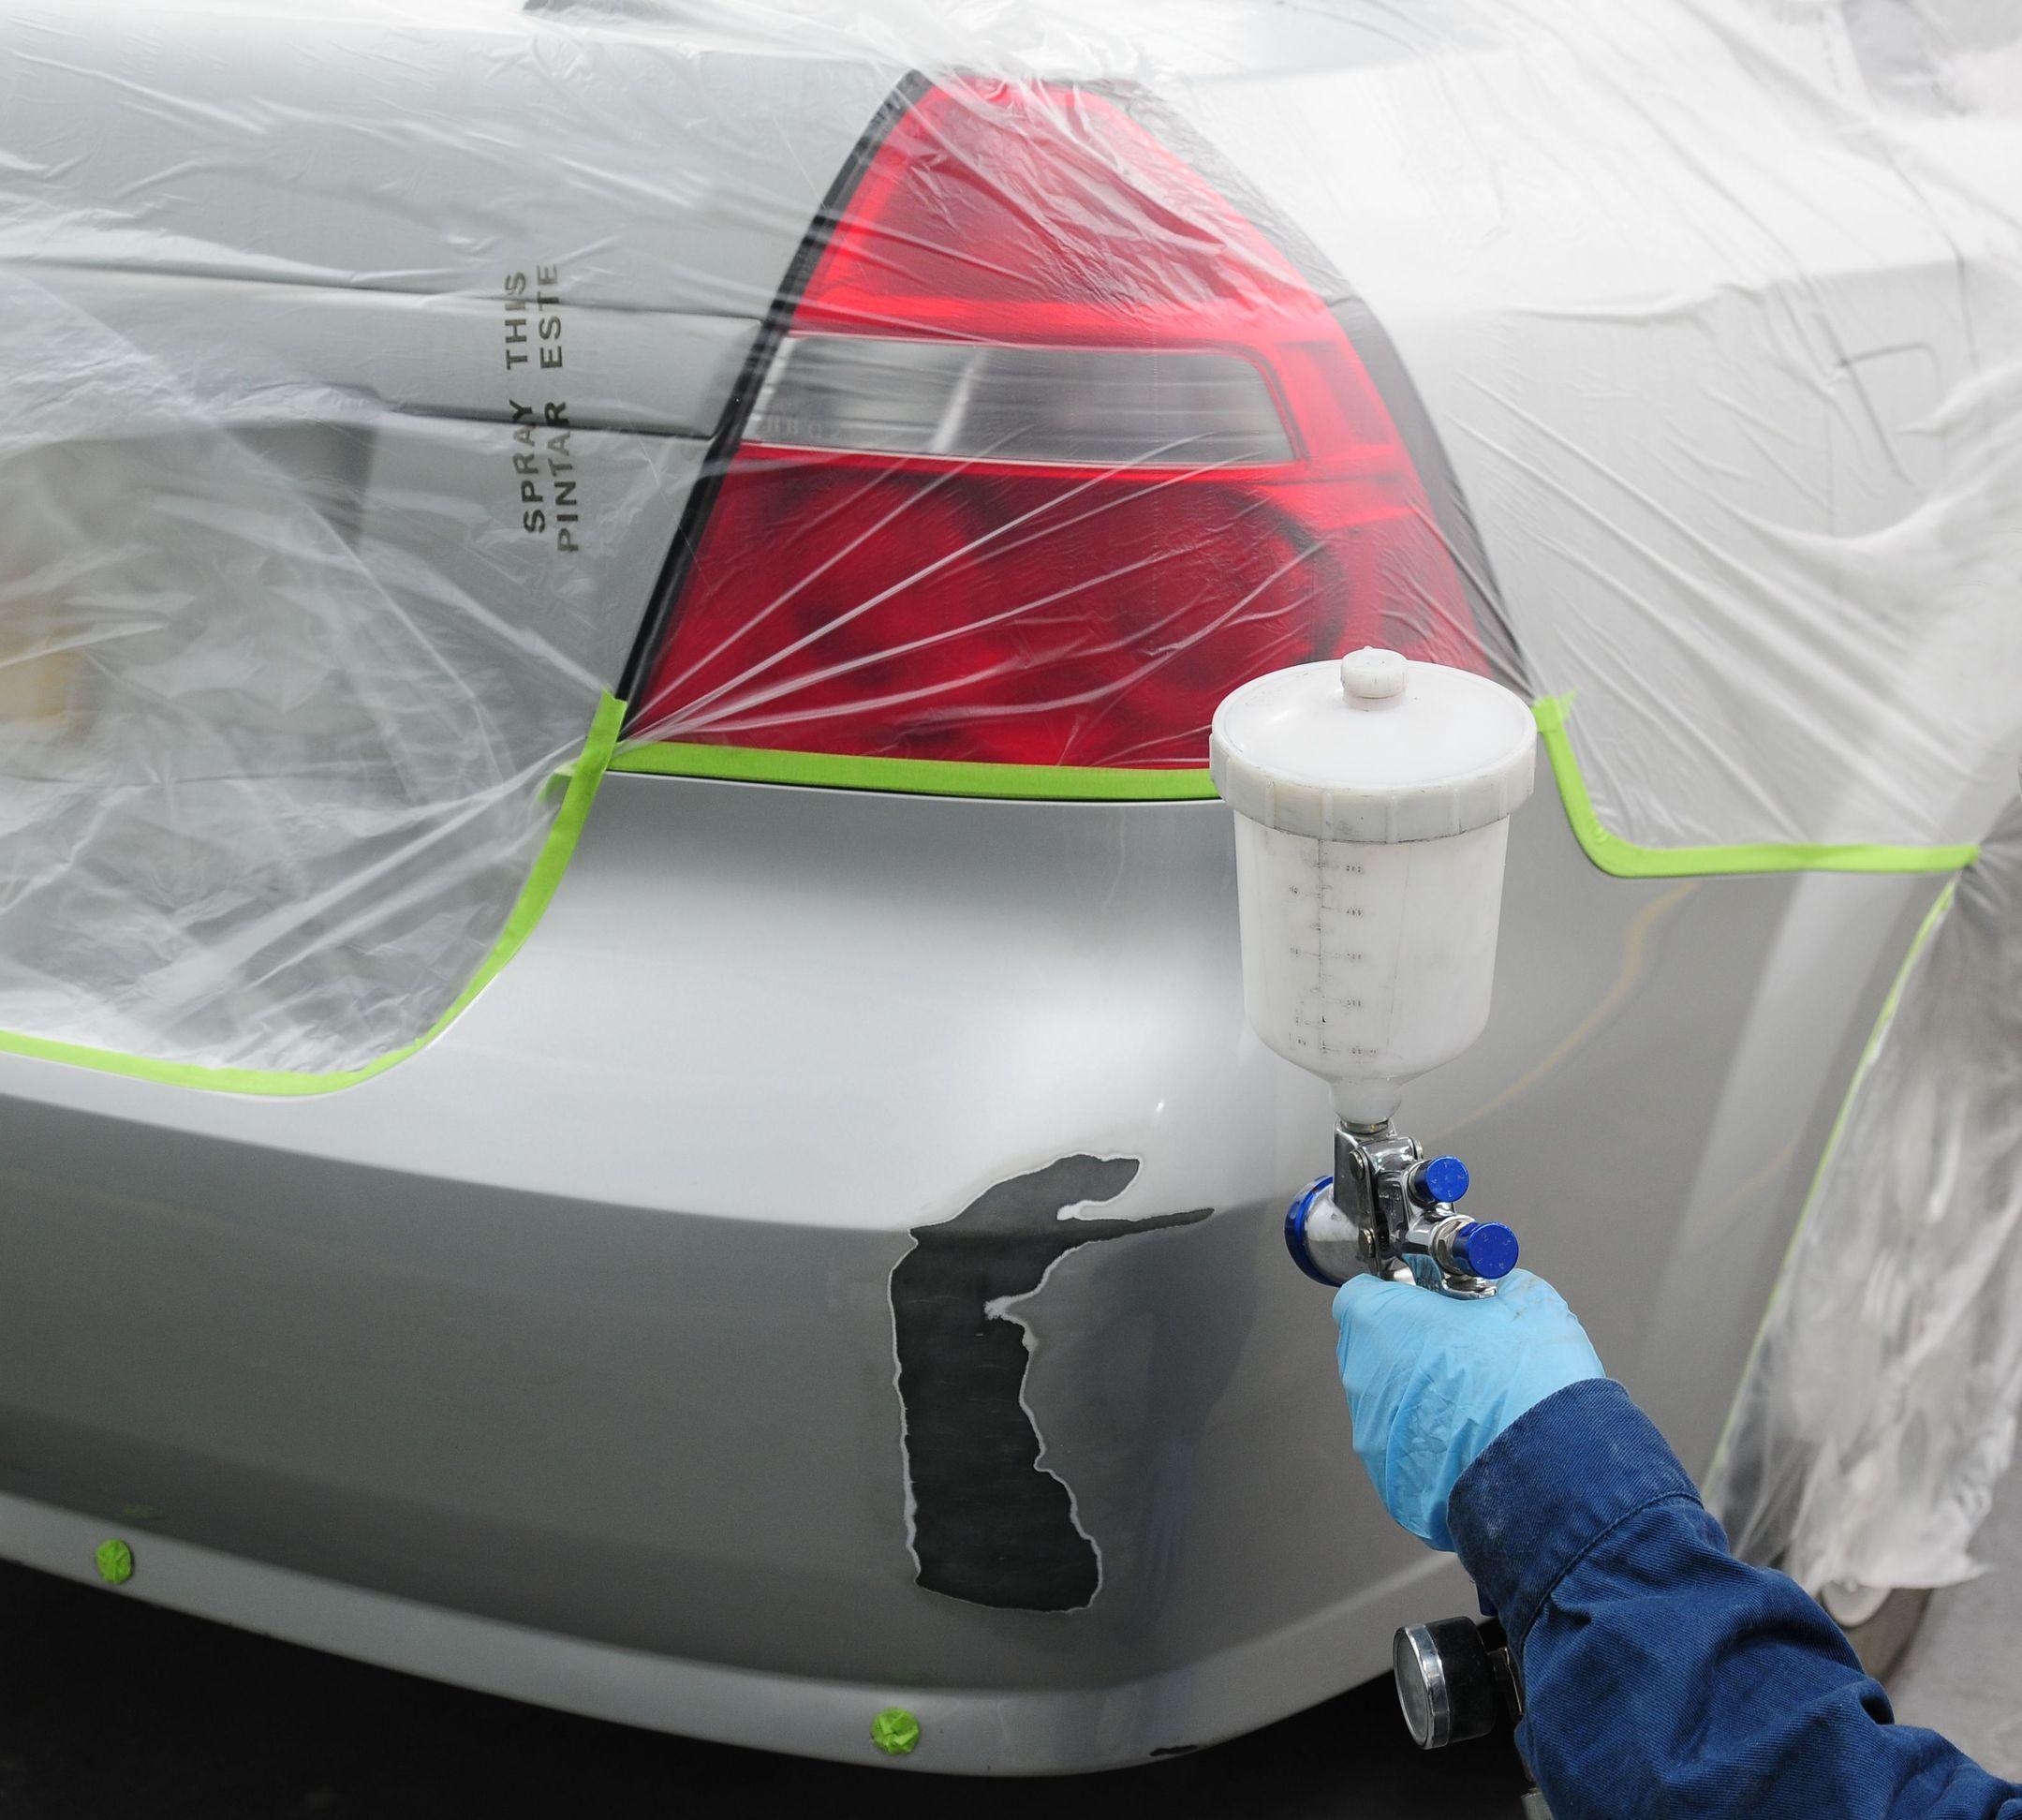 Самостоятельная покраска бампера автомобиля